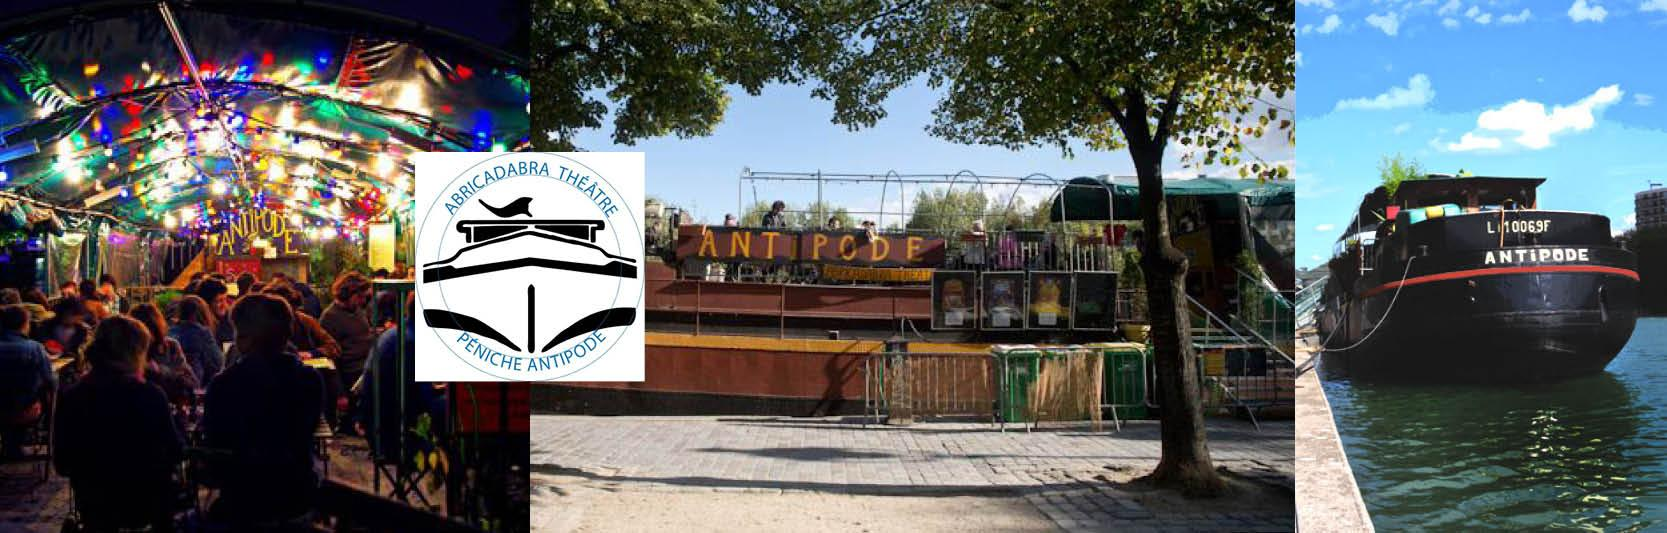 Péniche Antipode - Zone 2